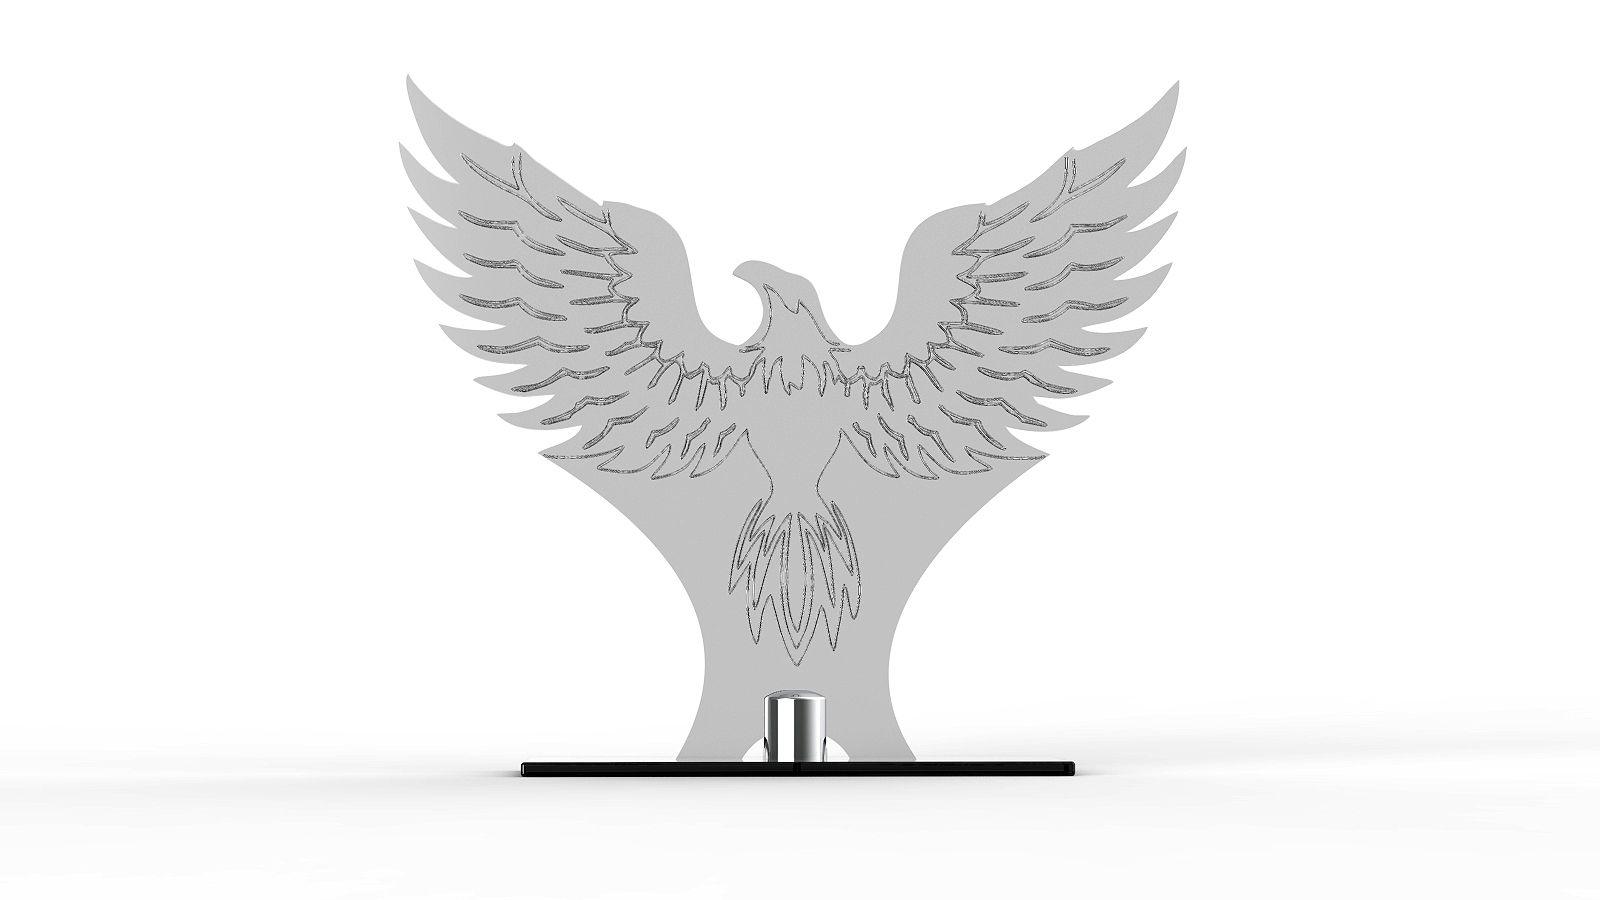 Troféu Personalizado TRF4900 22x19cm